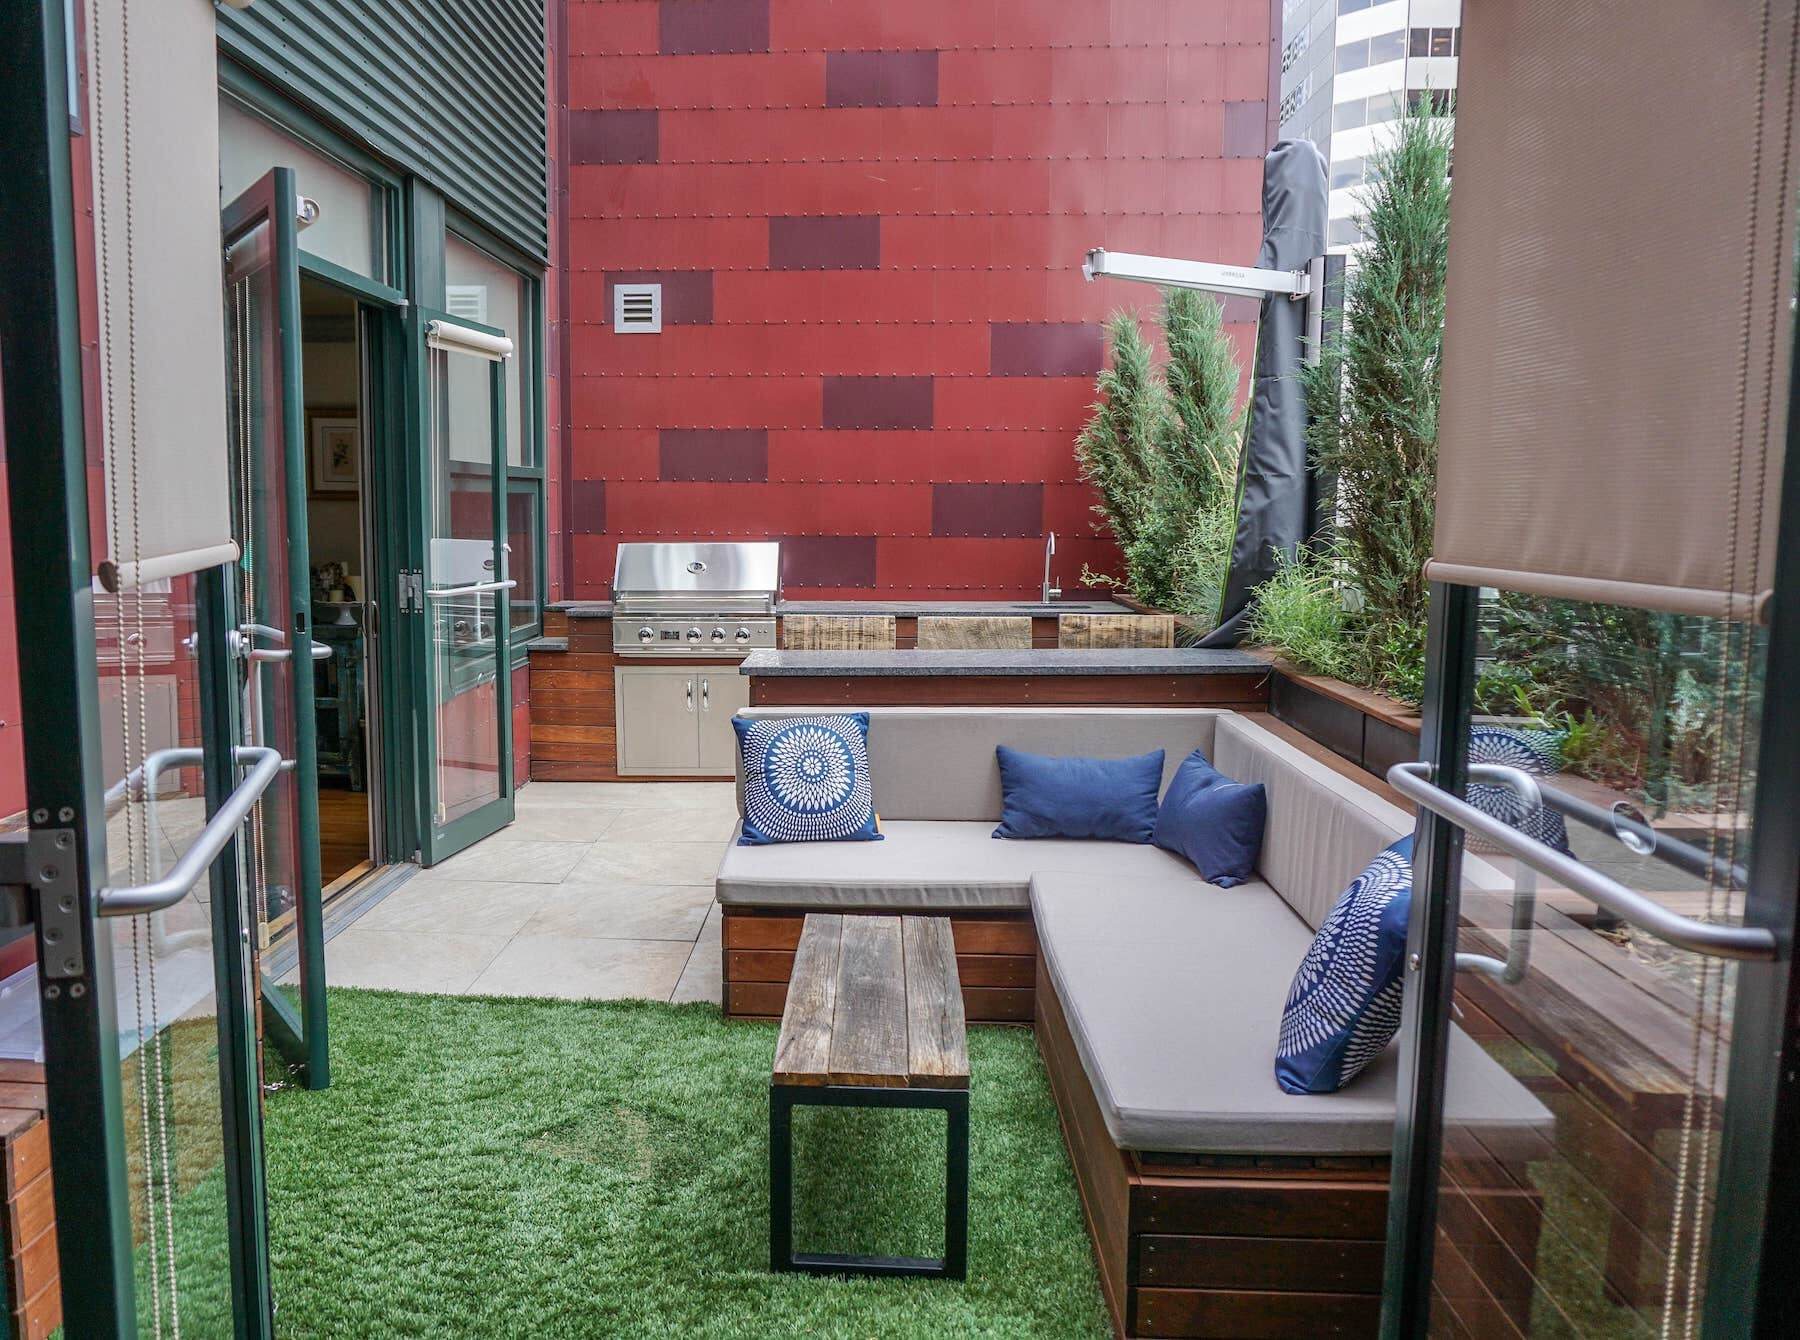 Built-In Furniture Rooftop Deck Outdoor Kitchen Downtown Denver